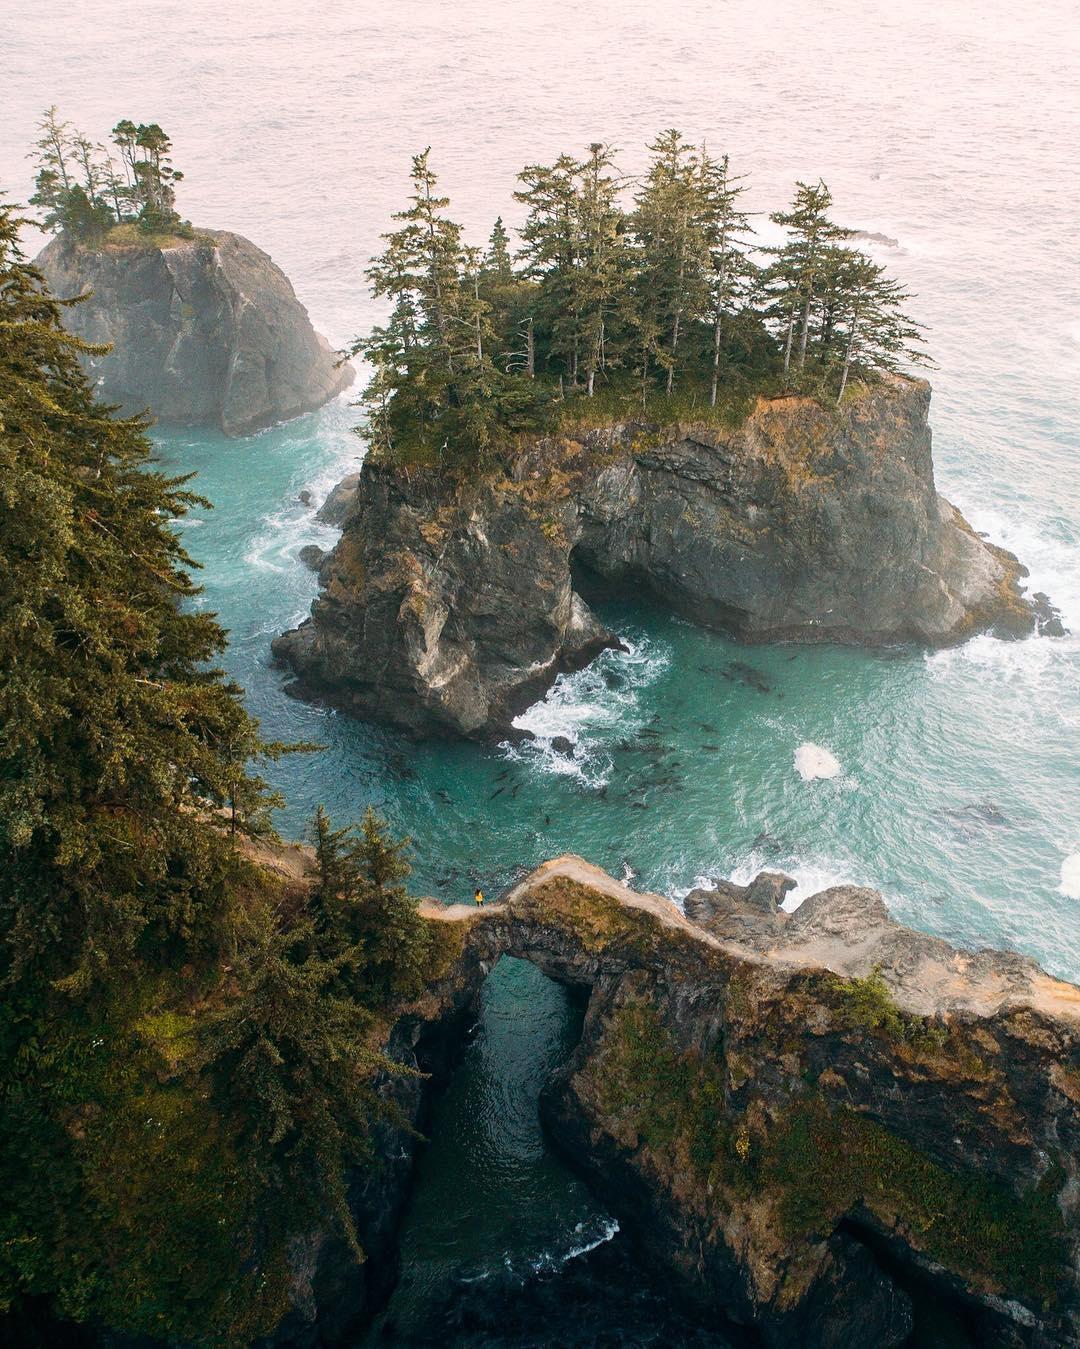 Stunning Travel Drone Photograp - photogrist | ello